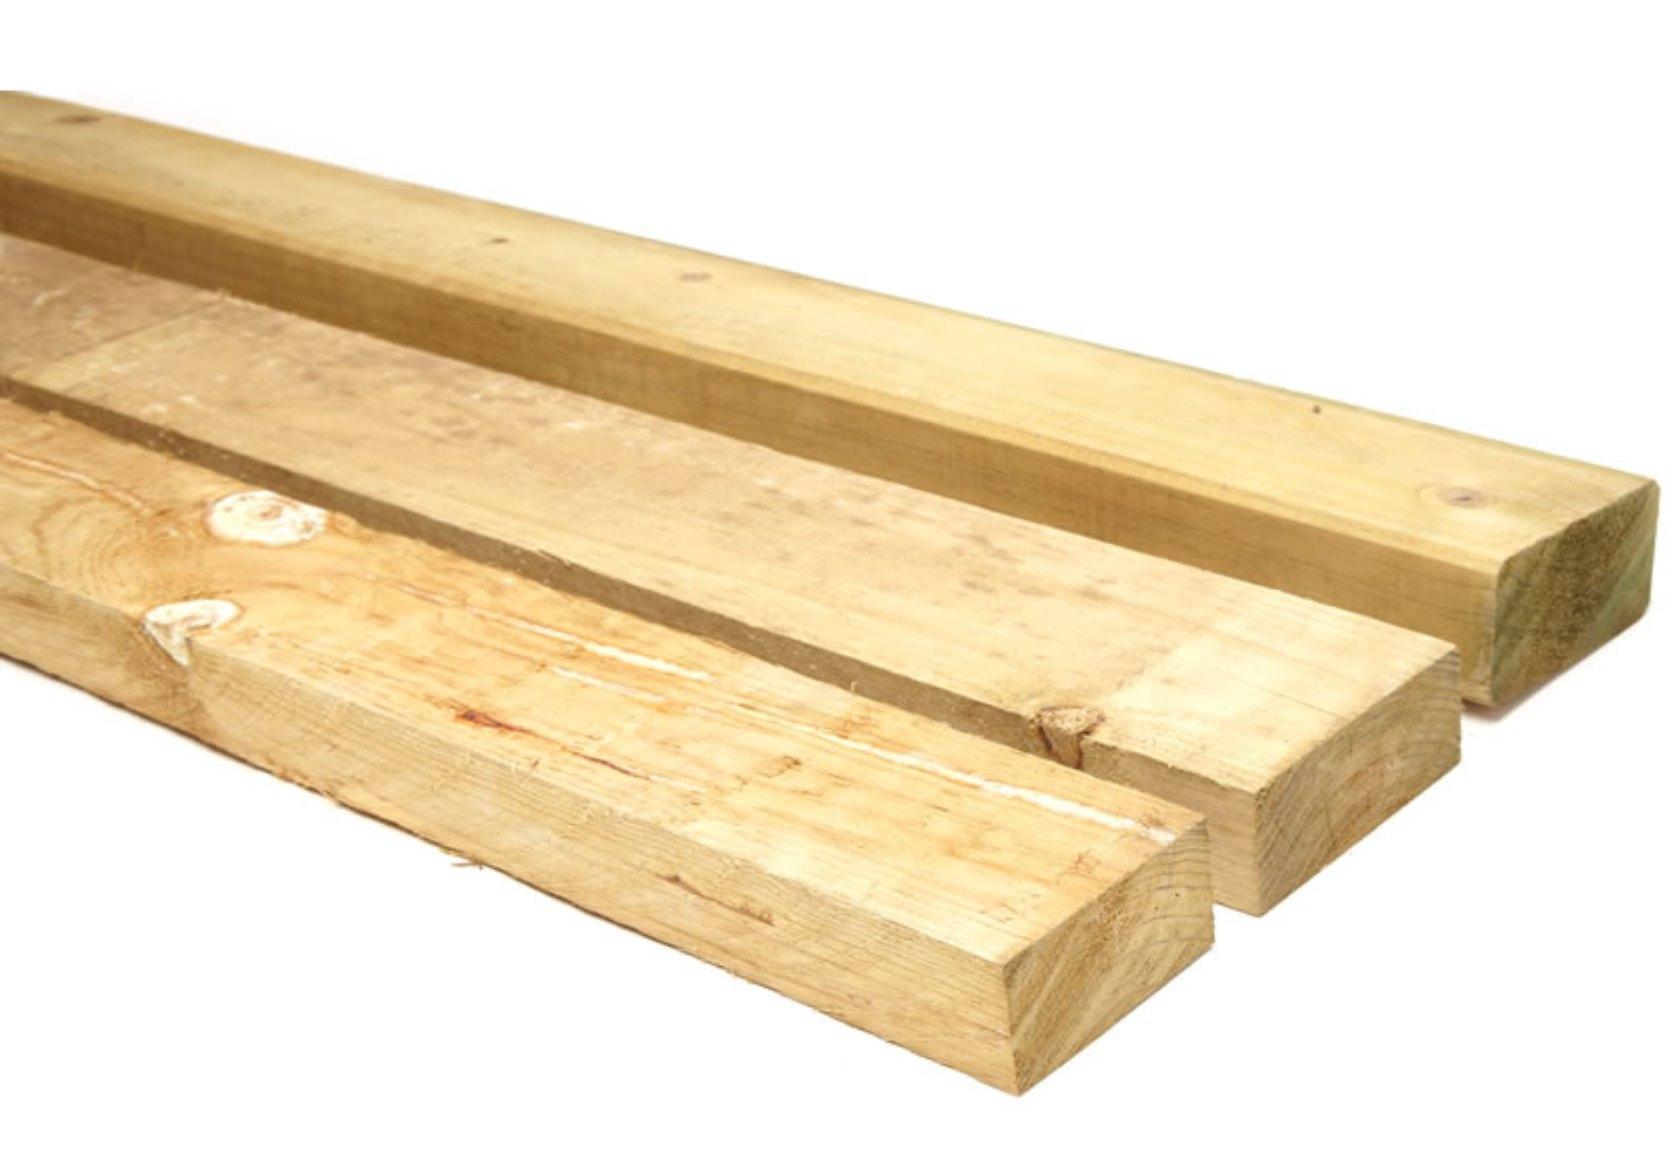 4.8m 75x38 Pine fence rails CCA Treated